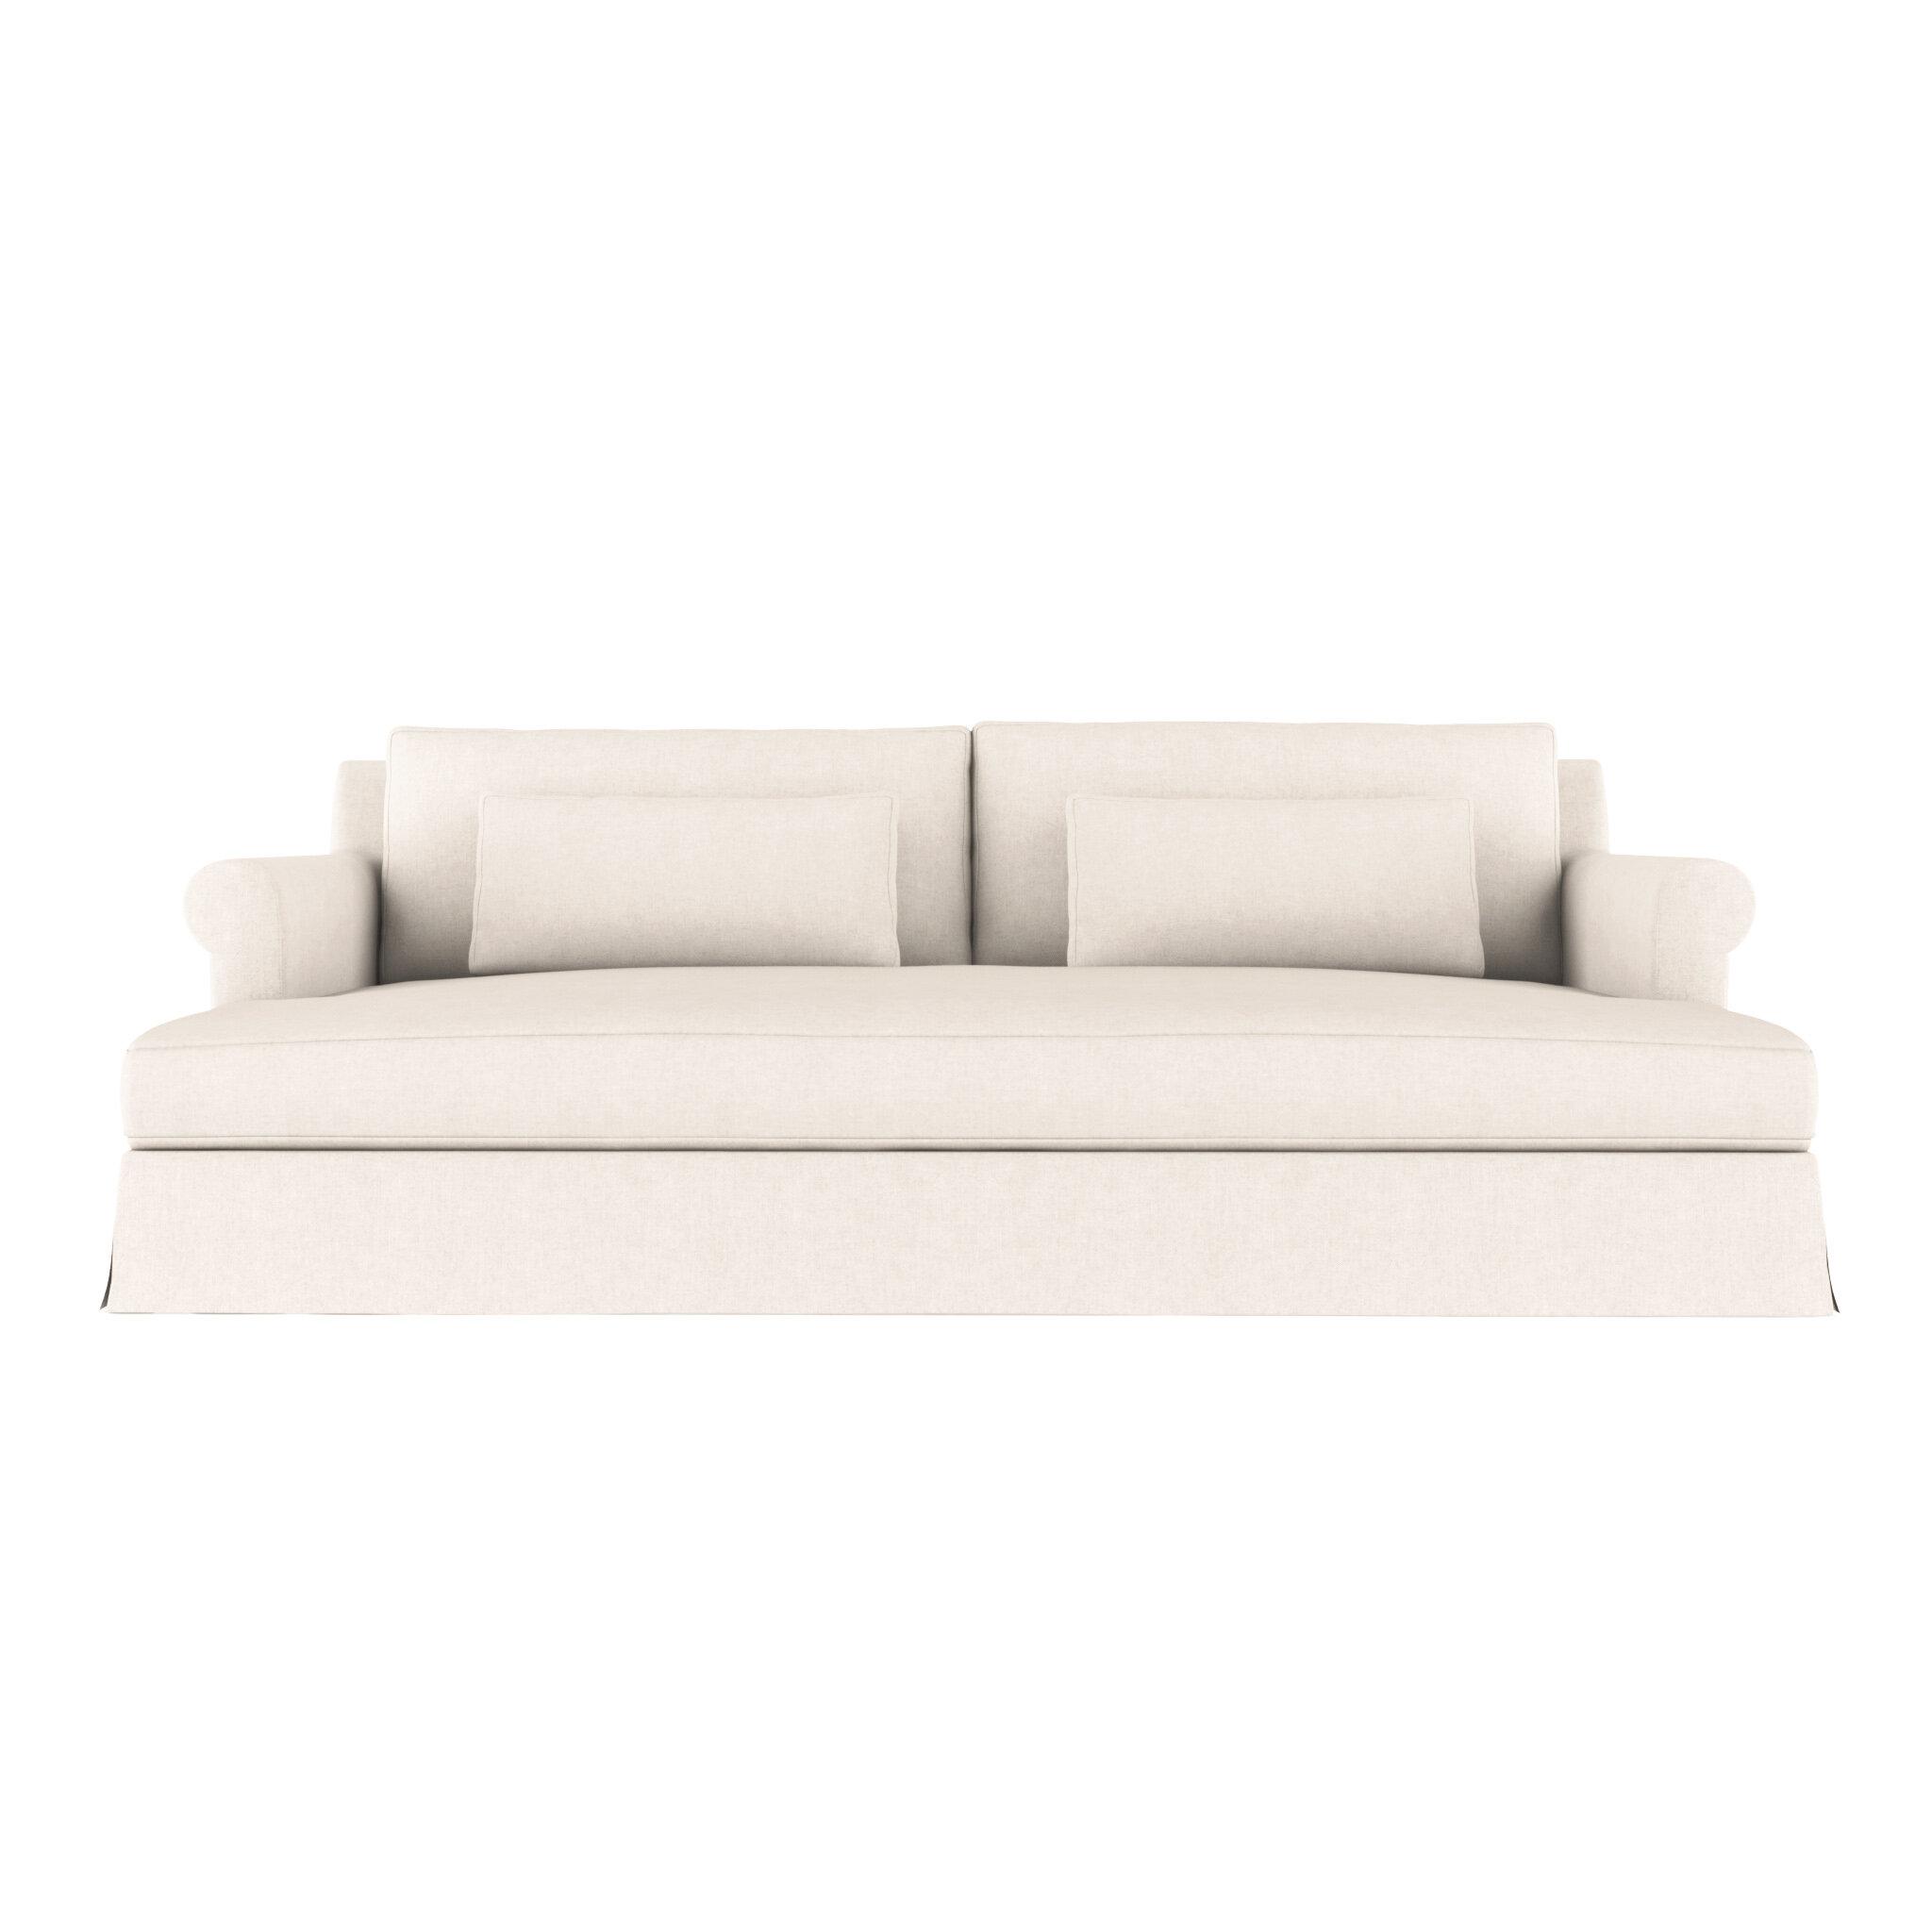 Tan Leather Sleeper Sofa Baci Living Room